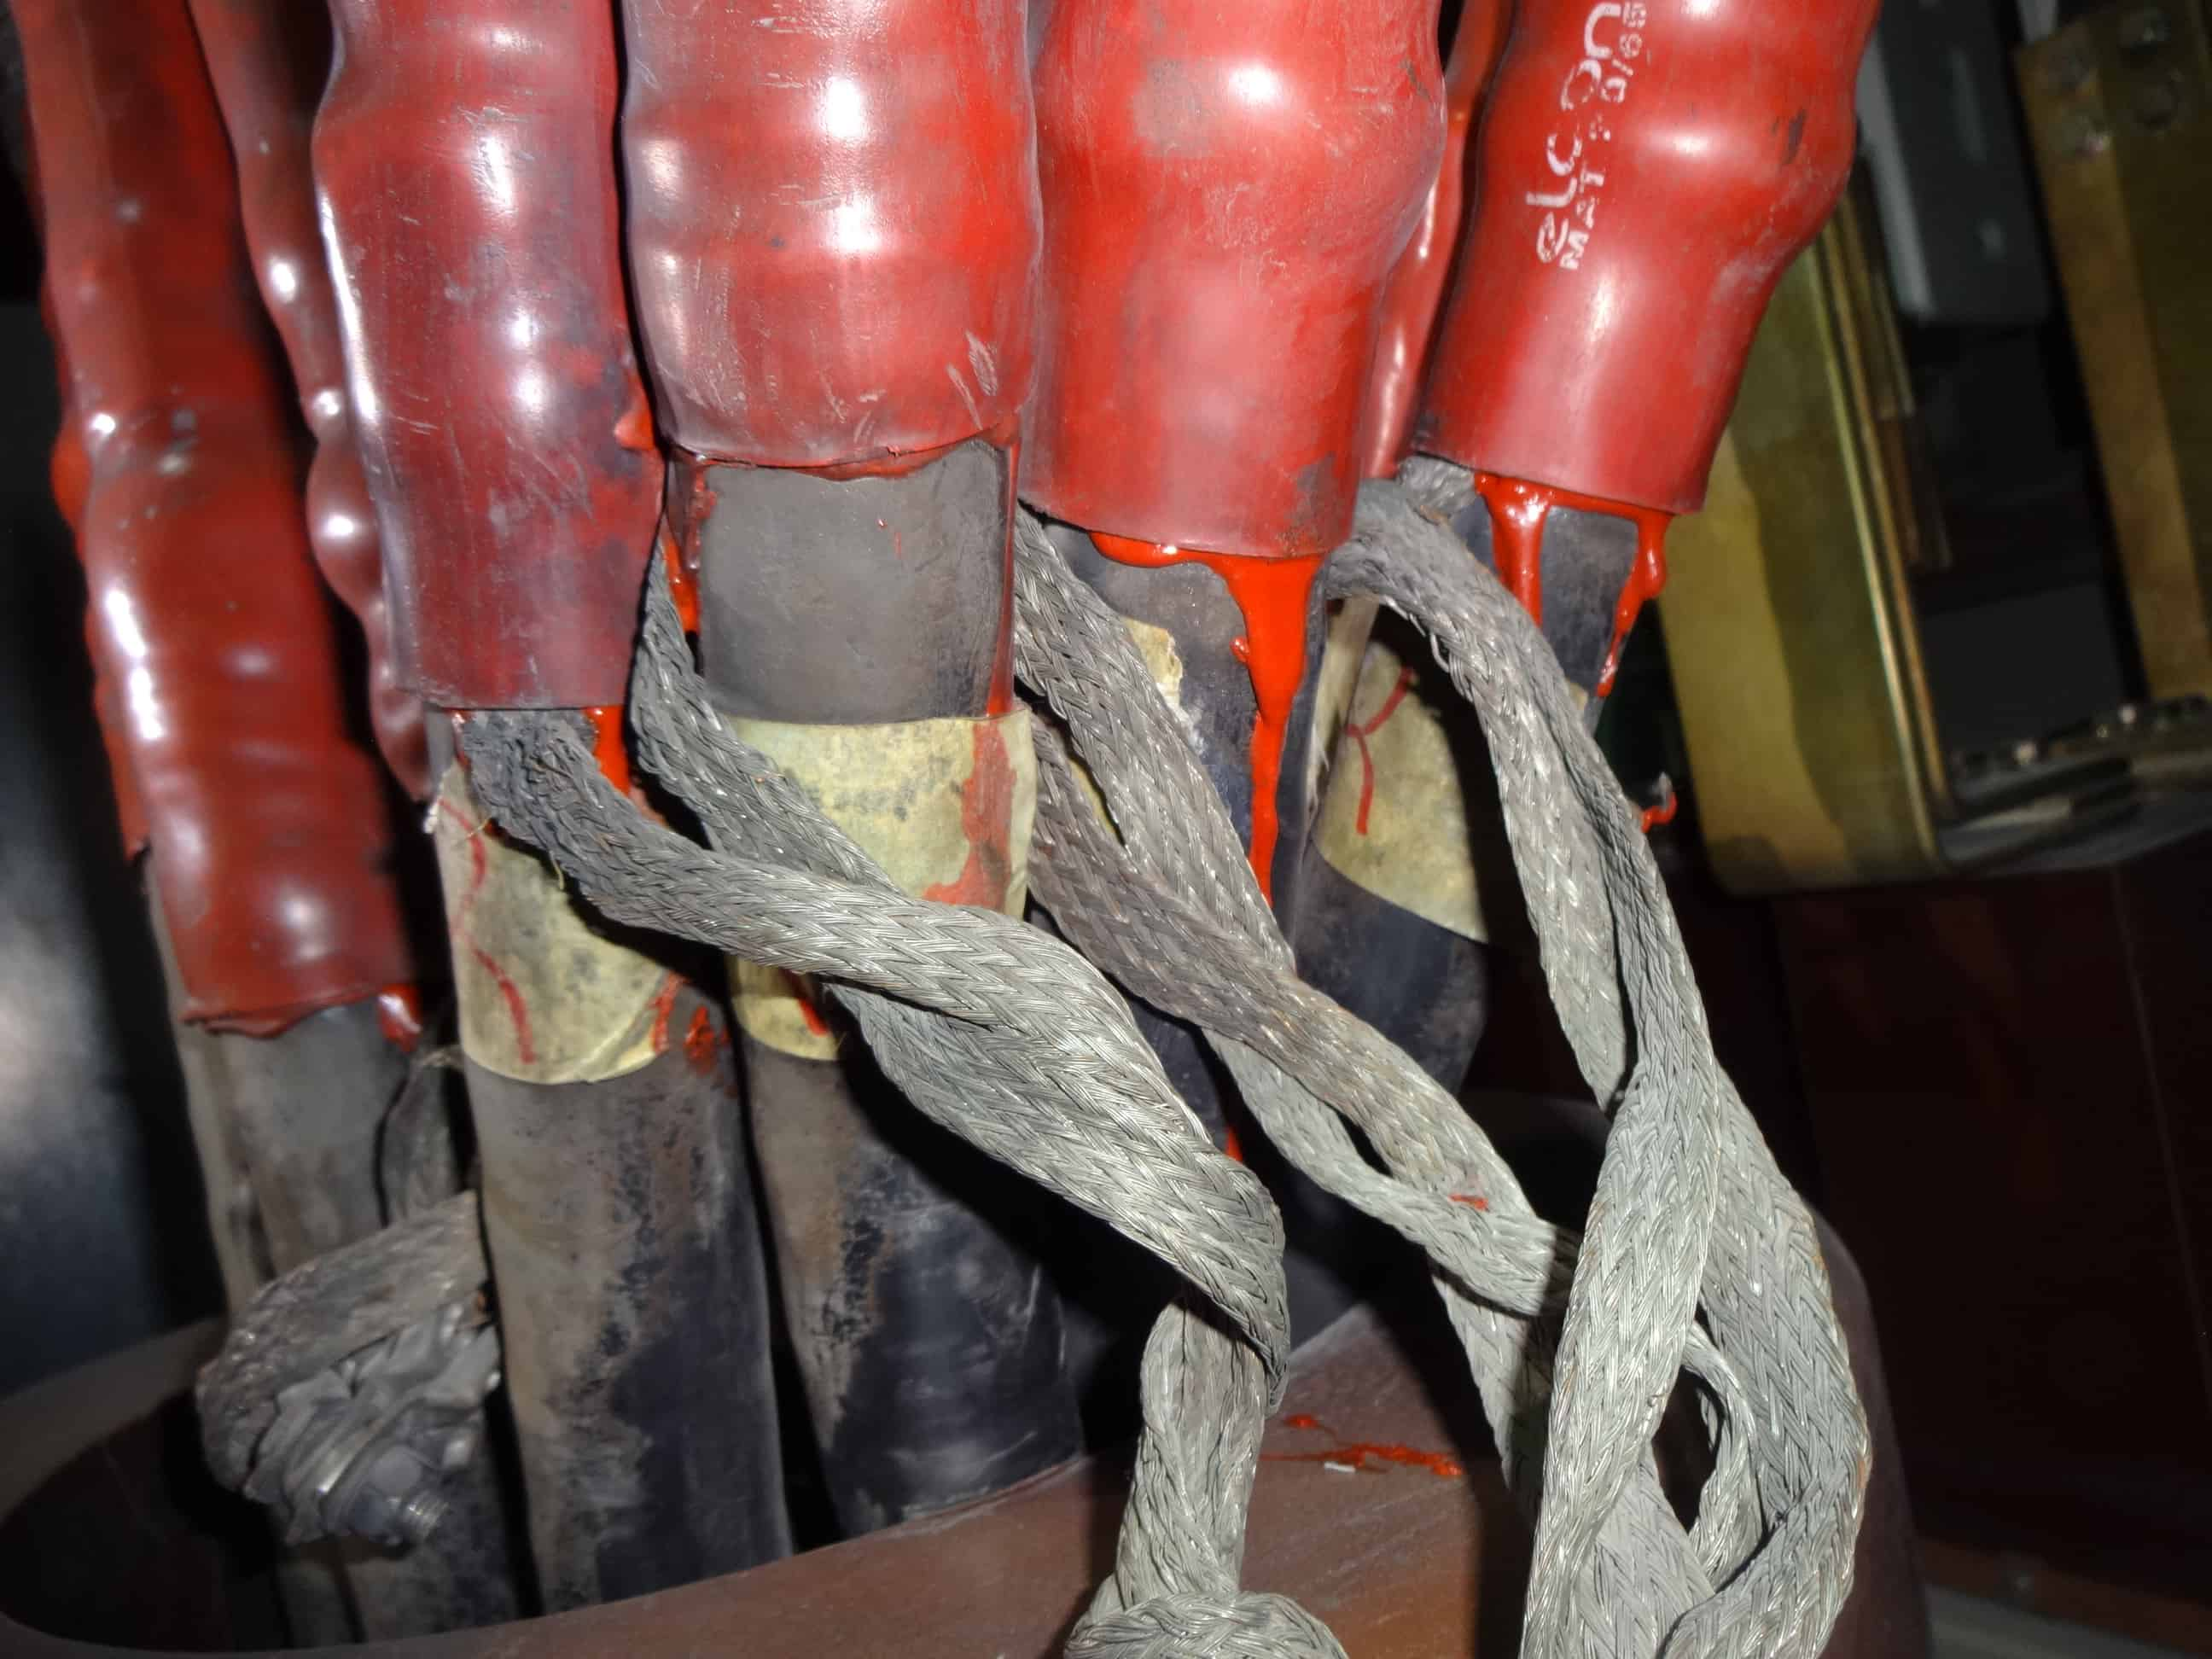 Heat Shrink Cable Terminations Potential Critical Medium